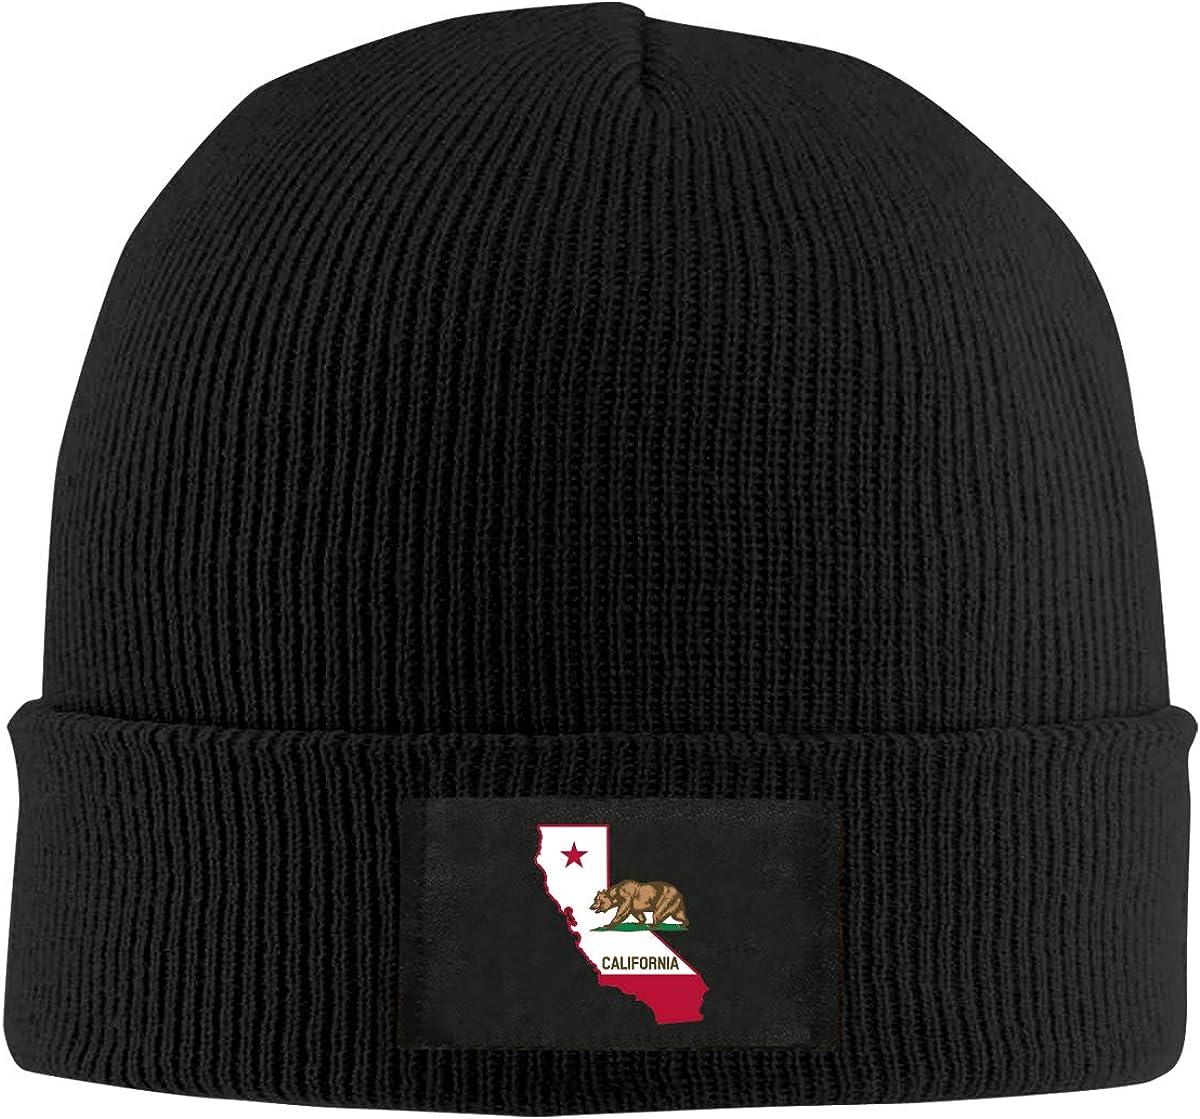 LRHUI California Flag Map Winter Knitted Hat Warm Wool Skull Beanie Cap